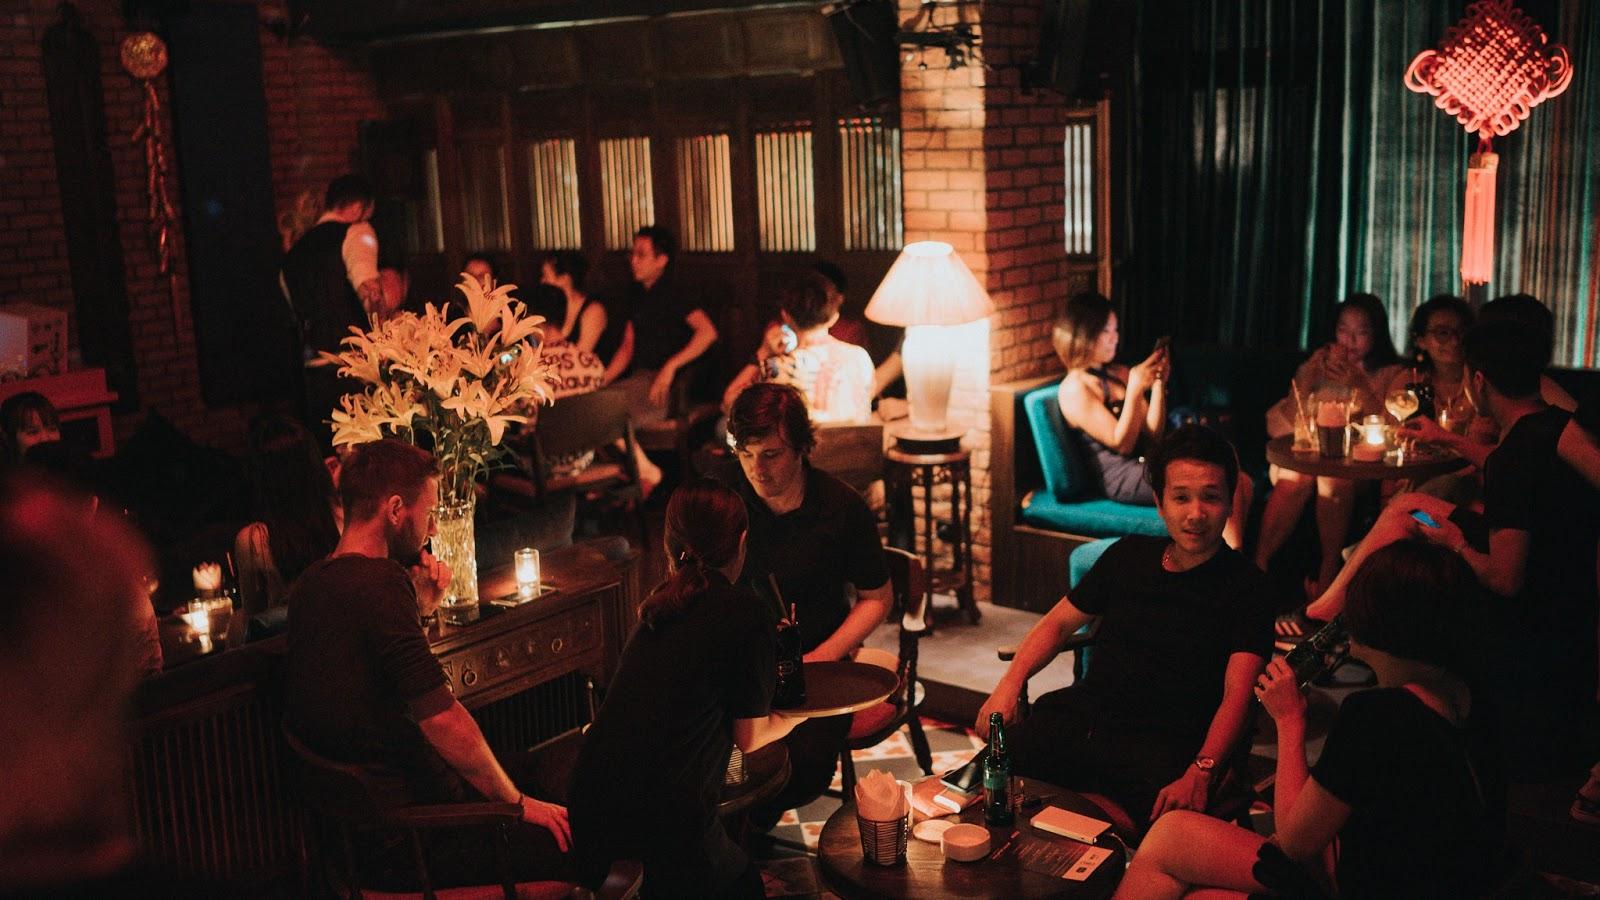 hanoi old quarter bars the kumquat tree interior